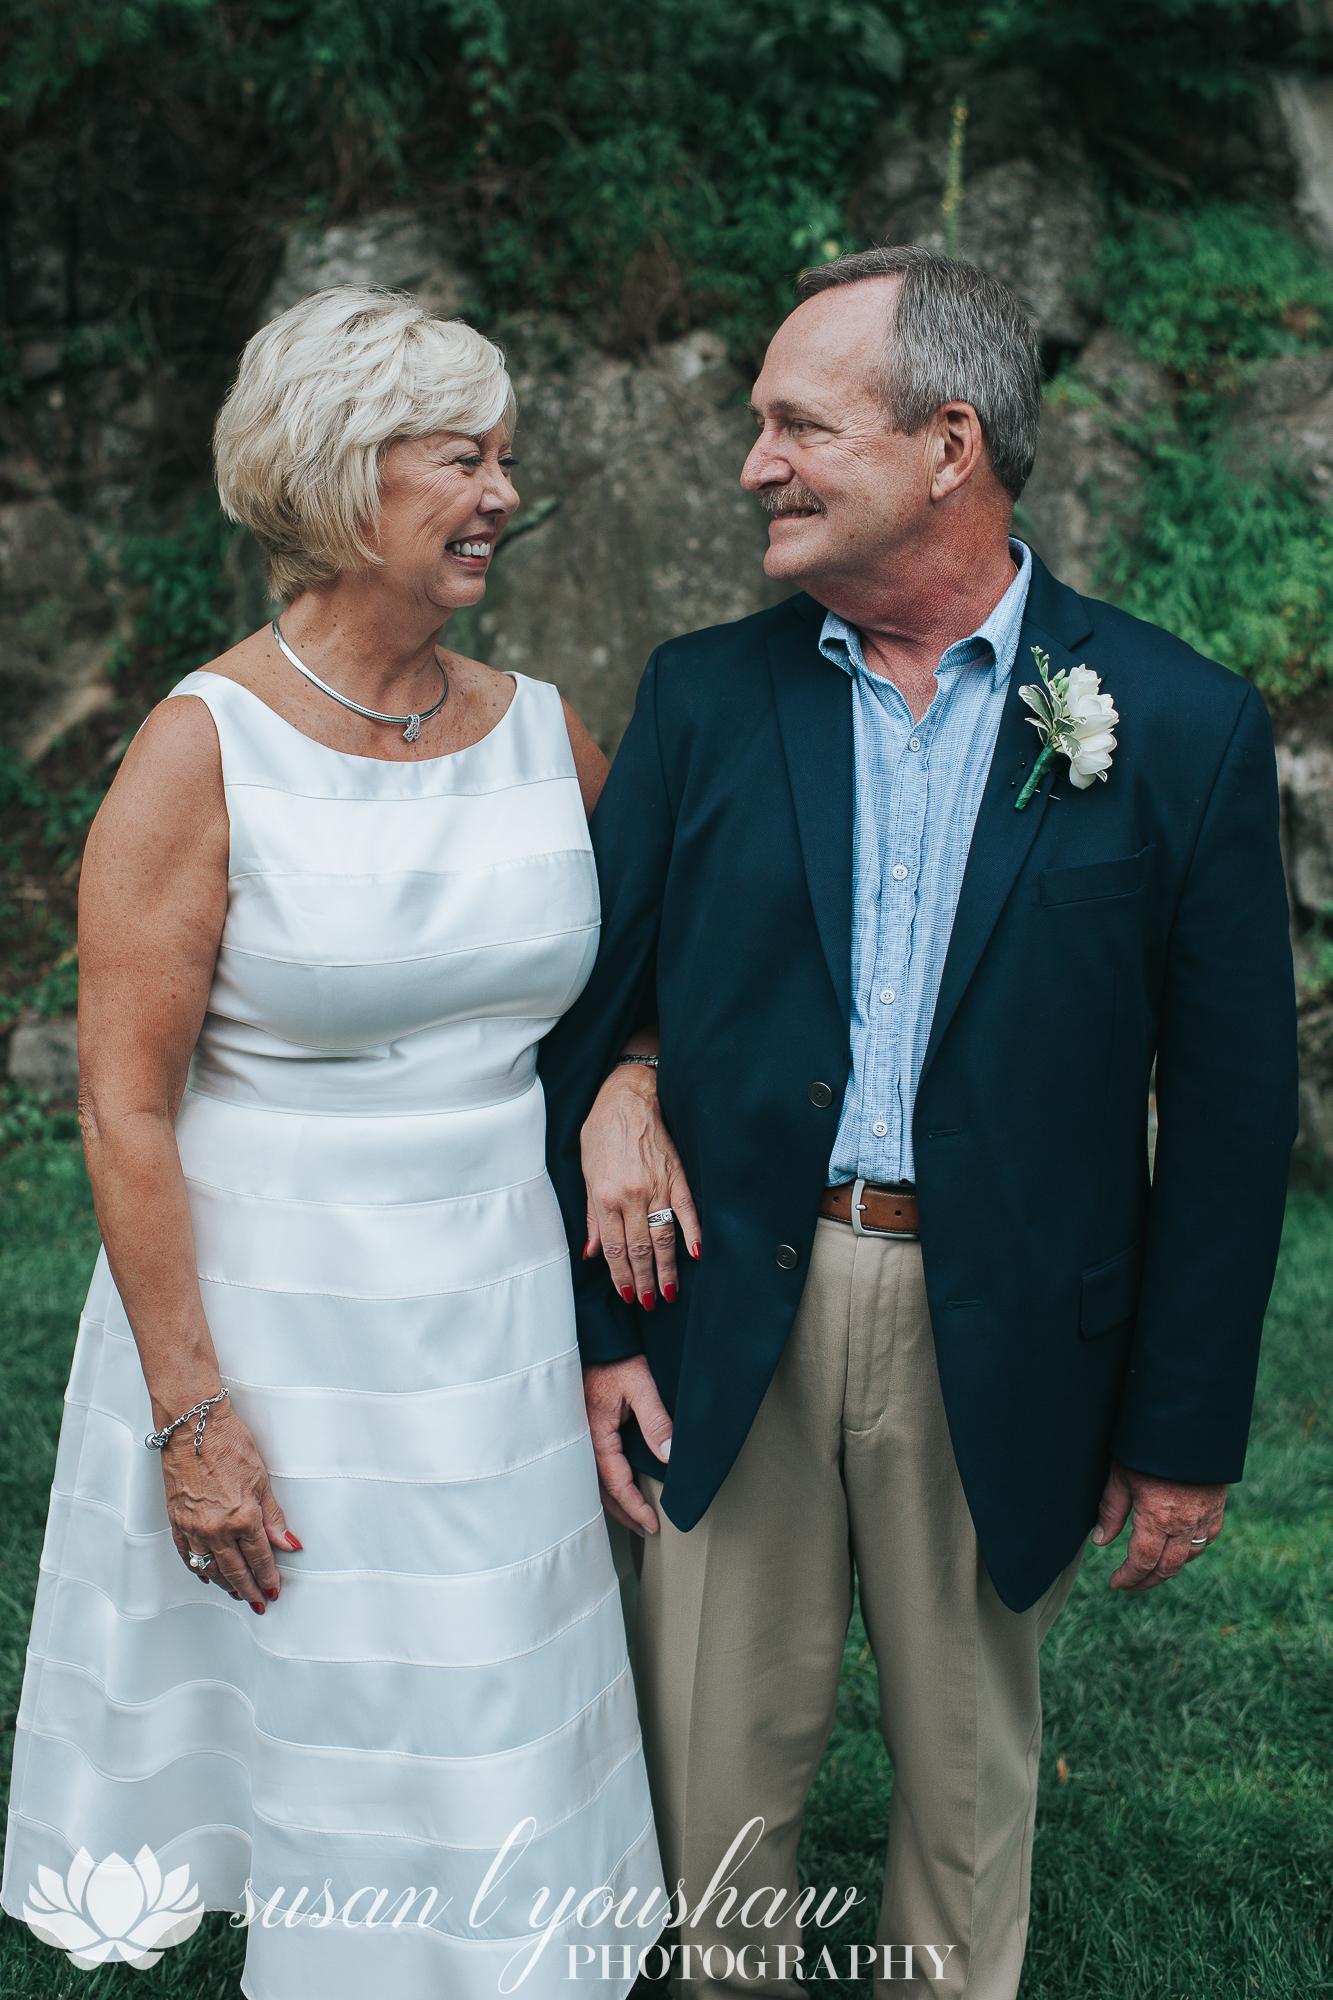 BLOG Carolyn Adams and Jim McCune 07-04-2018 SLY Photography-124.jpg